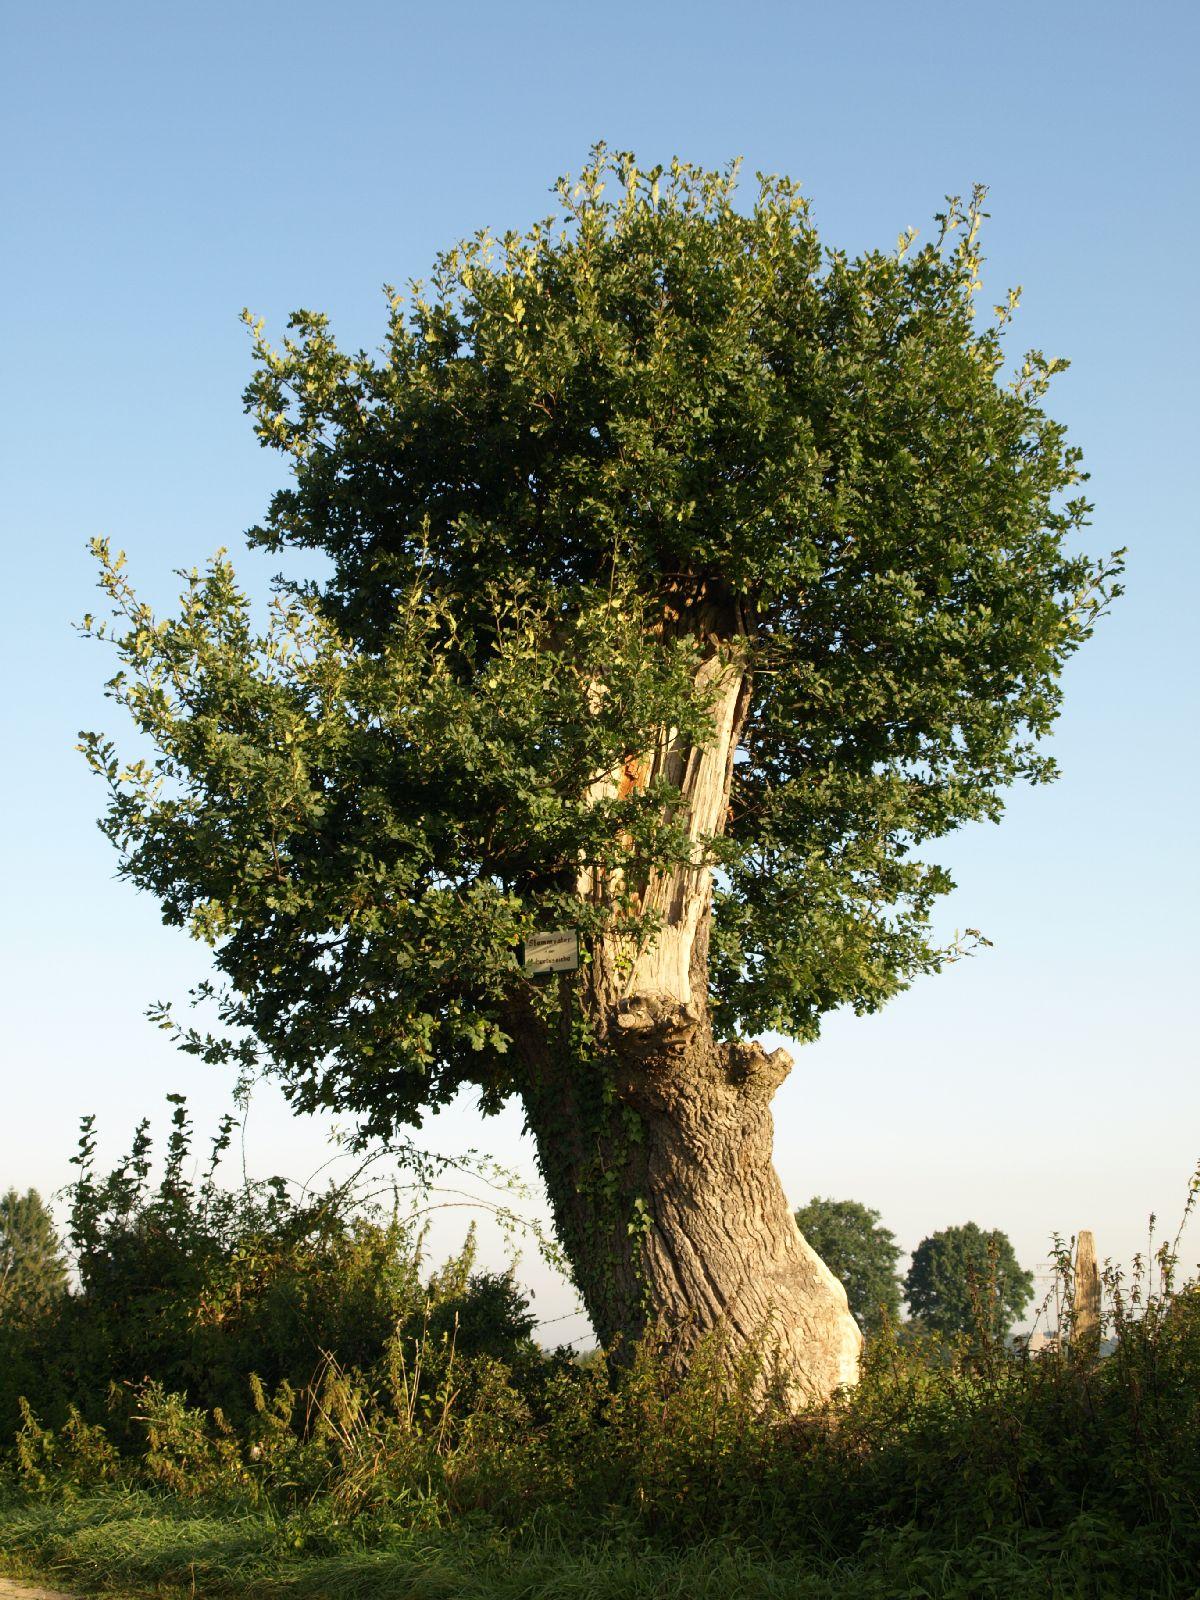 Pflanzen-Baum-Foto_Textur_B_P9205192